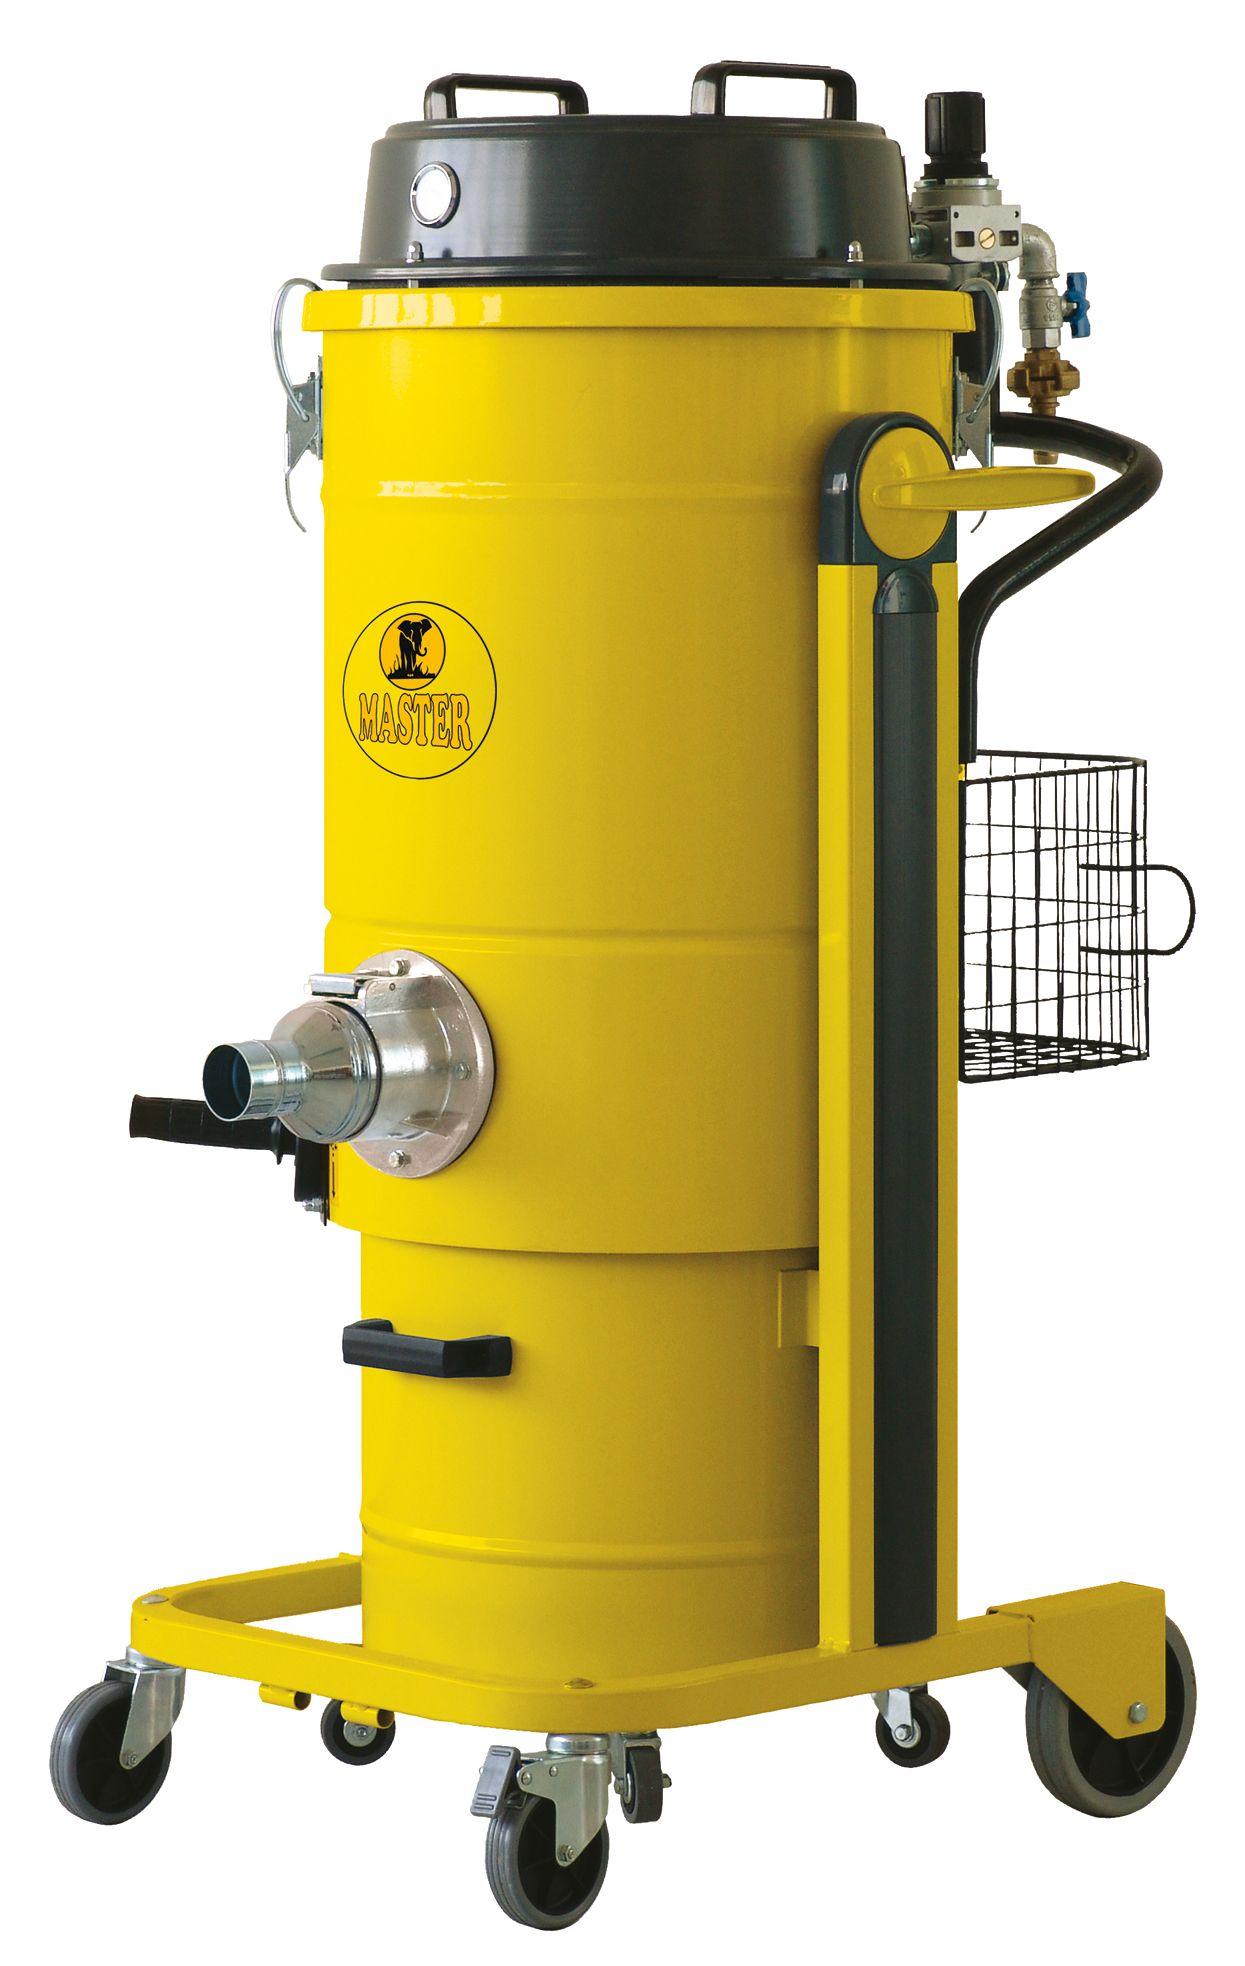 aspirateur industriel pneumatique mistral 352 ds air. Black Bedroom Furniture Sets. Home Design Ideas